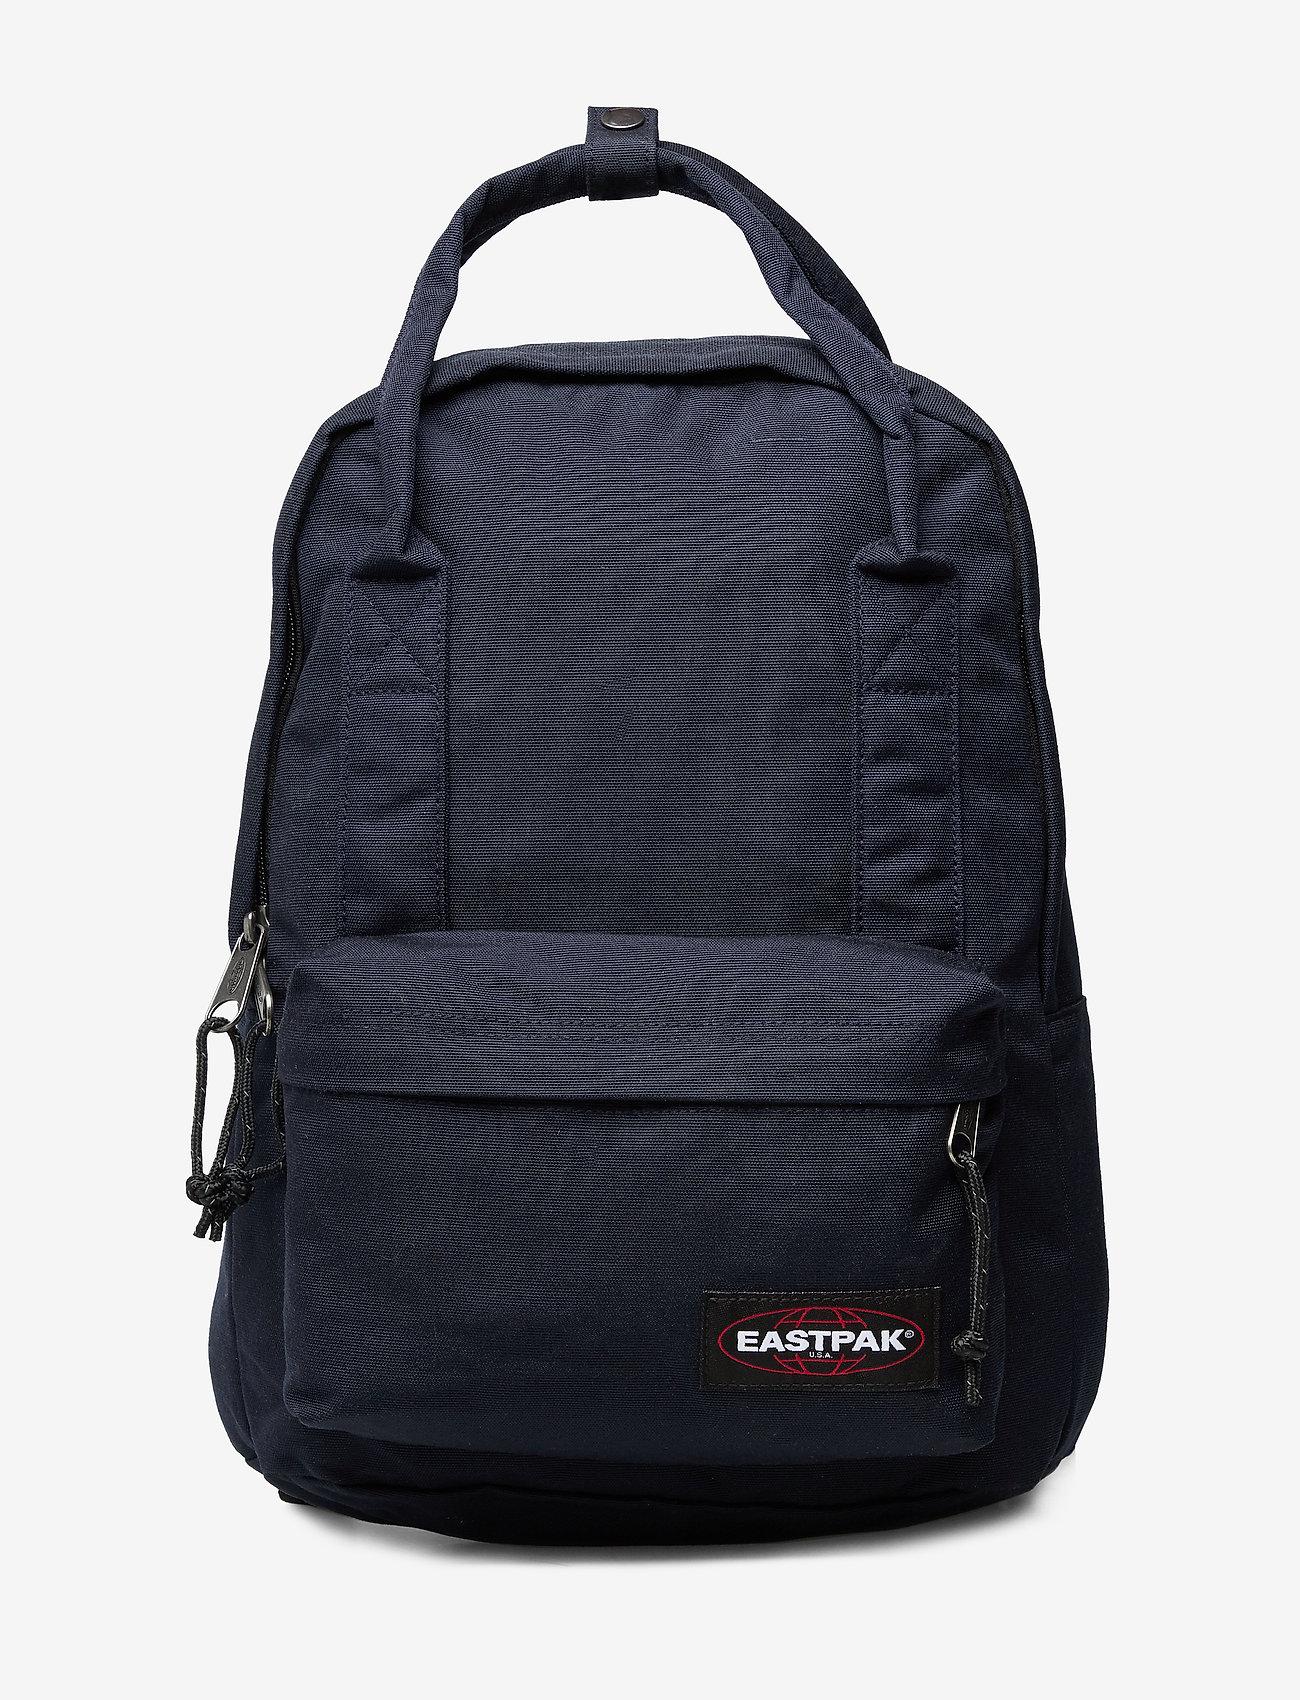 Eastpak - PADDED SHOP'R BLACK - rucksäcke - cloud navy - 0